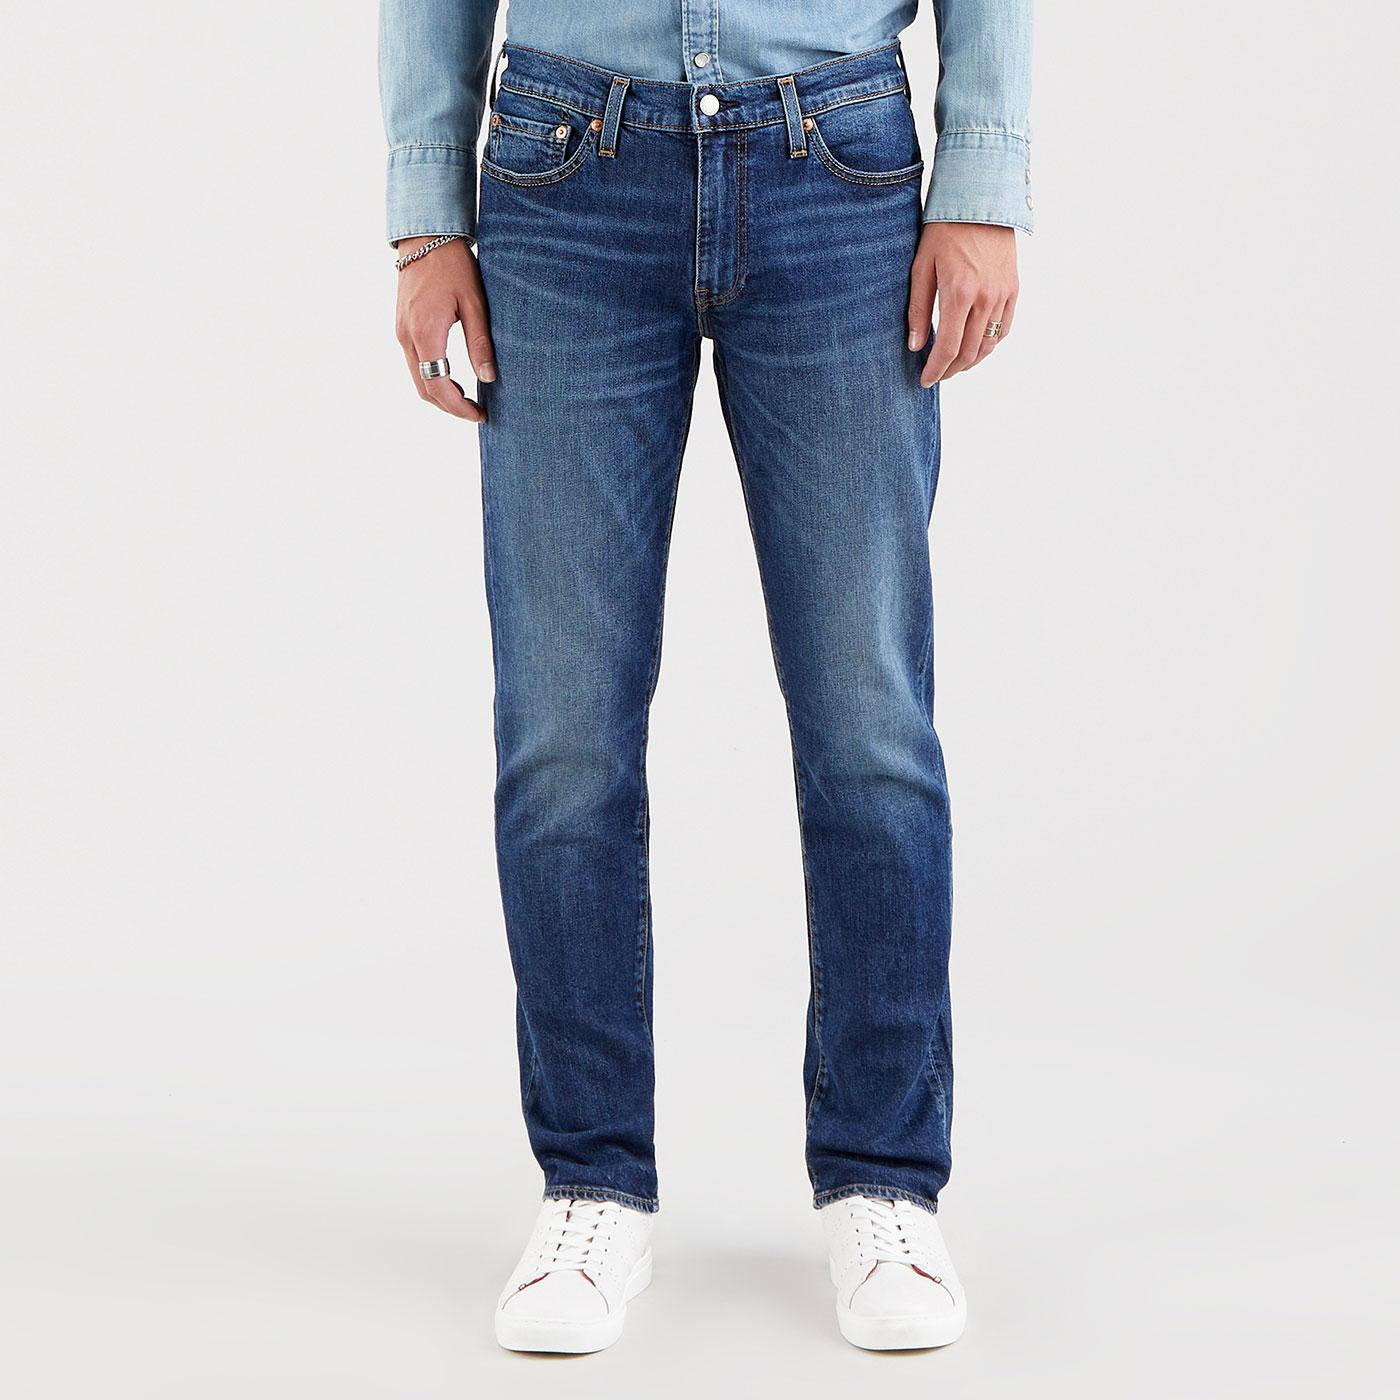 LEVI'S 511 Slim Retro Jeans (Band Wagon Adv)